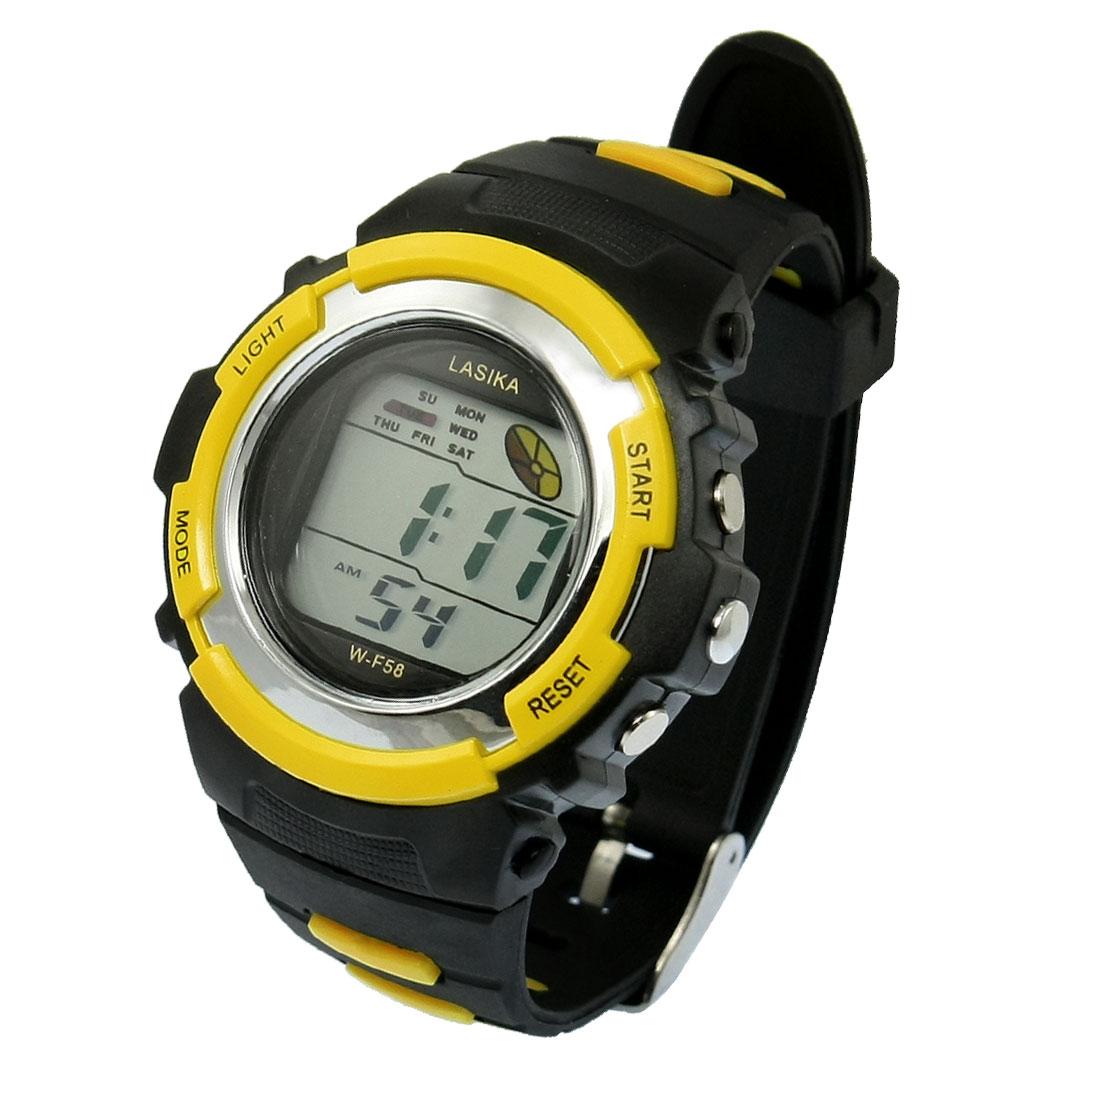 Unisex Date Week Hour Alarm Clock LCD Display Coldlight Digital Watch Stopwatch